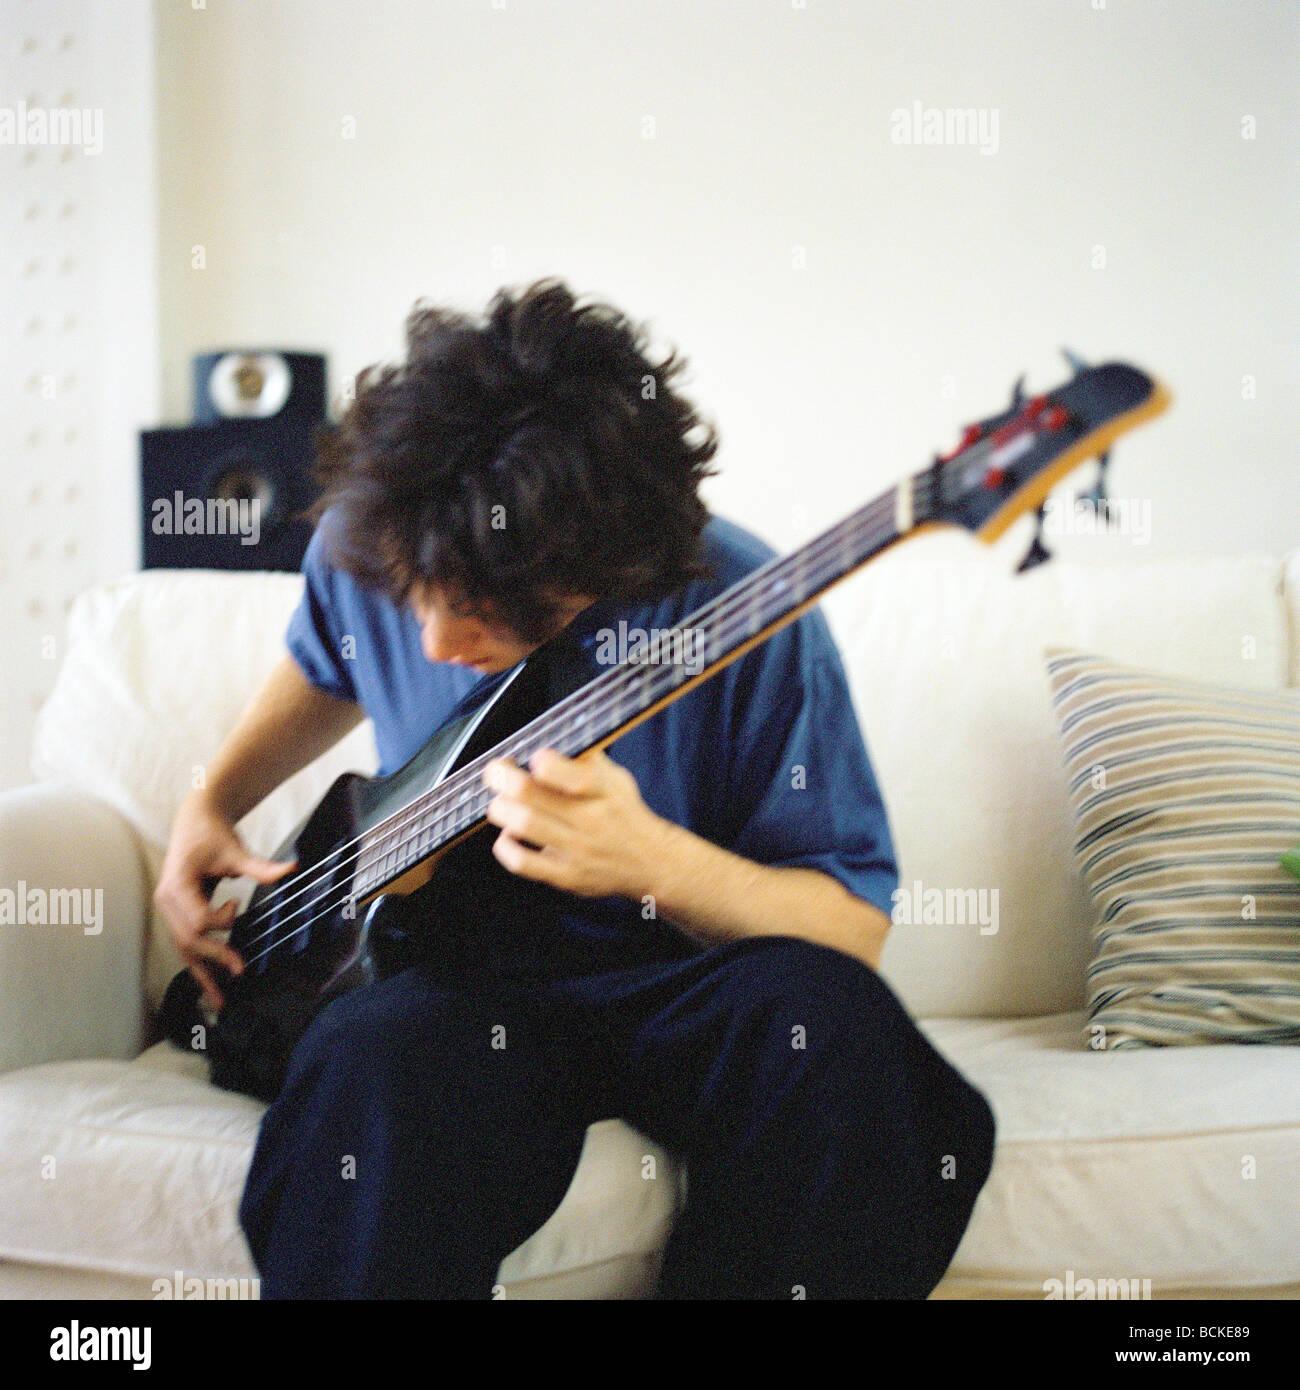 Young man playing guitar Photo Stock